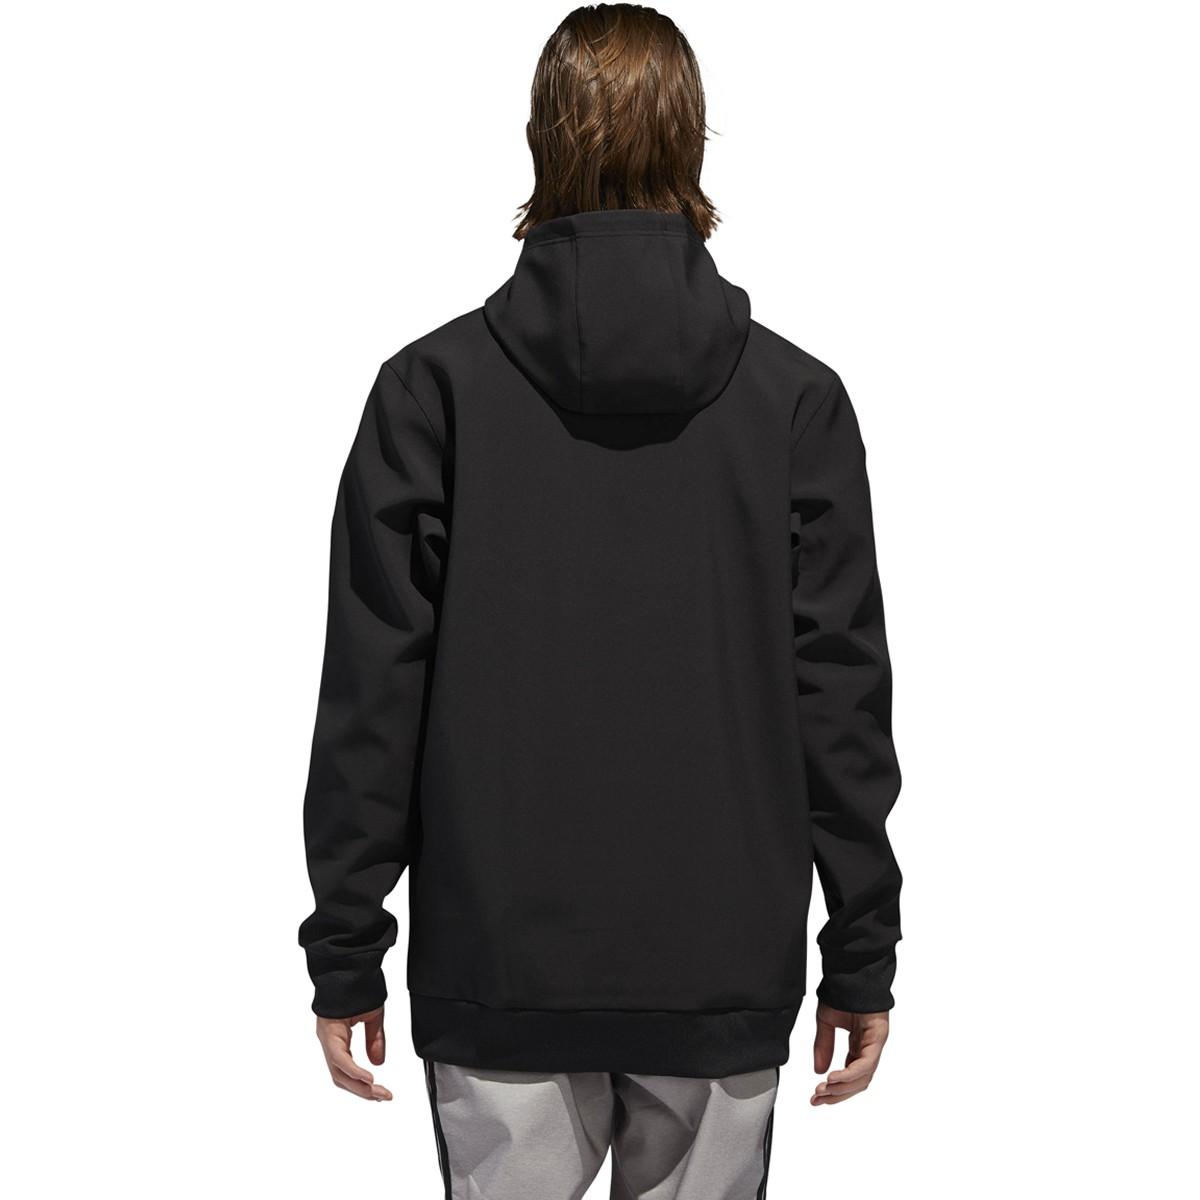 Adidas 2XL For Creators Men's Athletics Team Issue Full Zip Hoodie Bos Logo